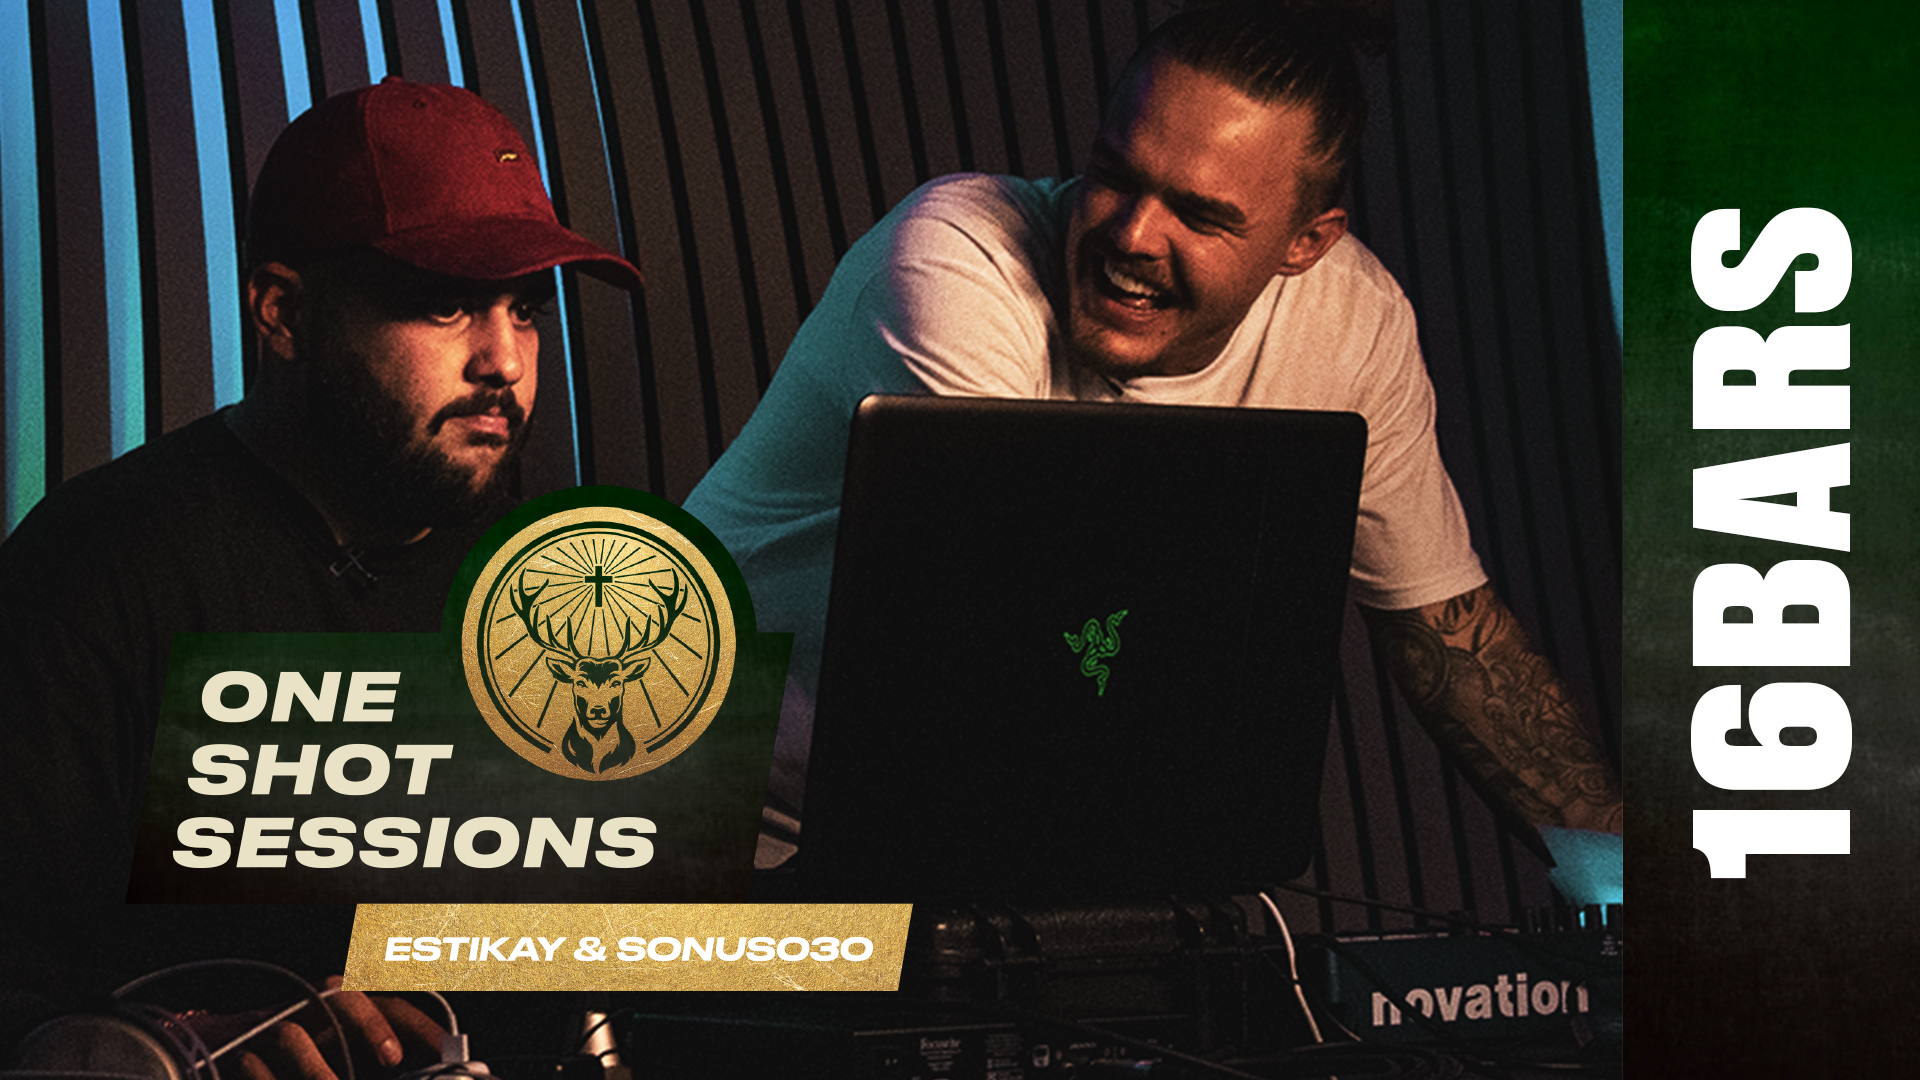 Estikay & Sonus030: Song + Video in 6 Stunden | One Shot Sessions by Jägermeister